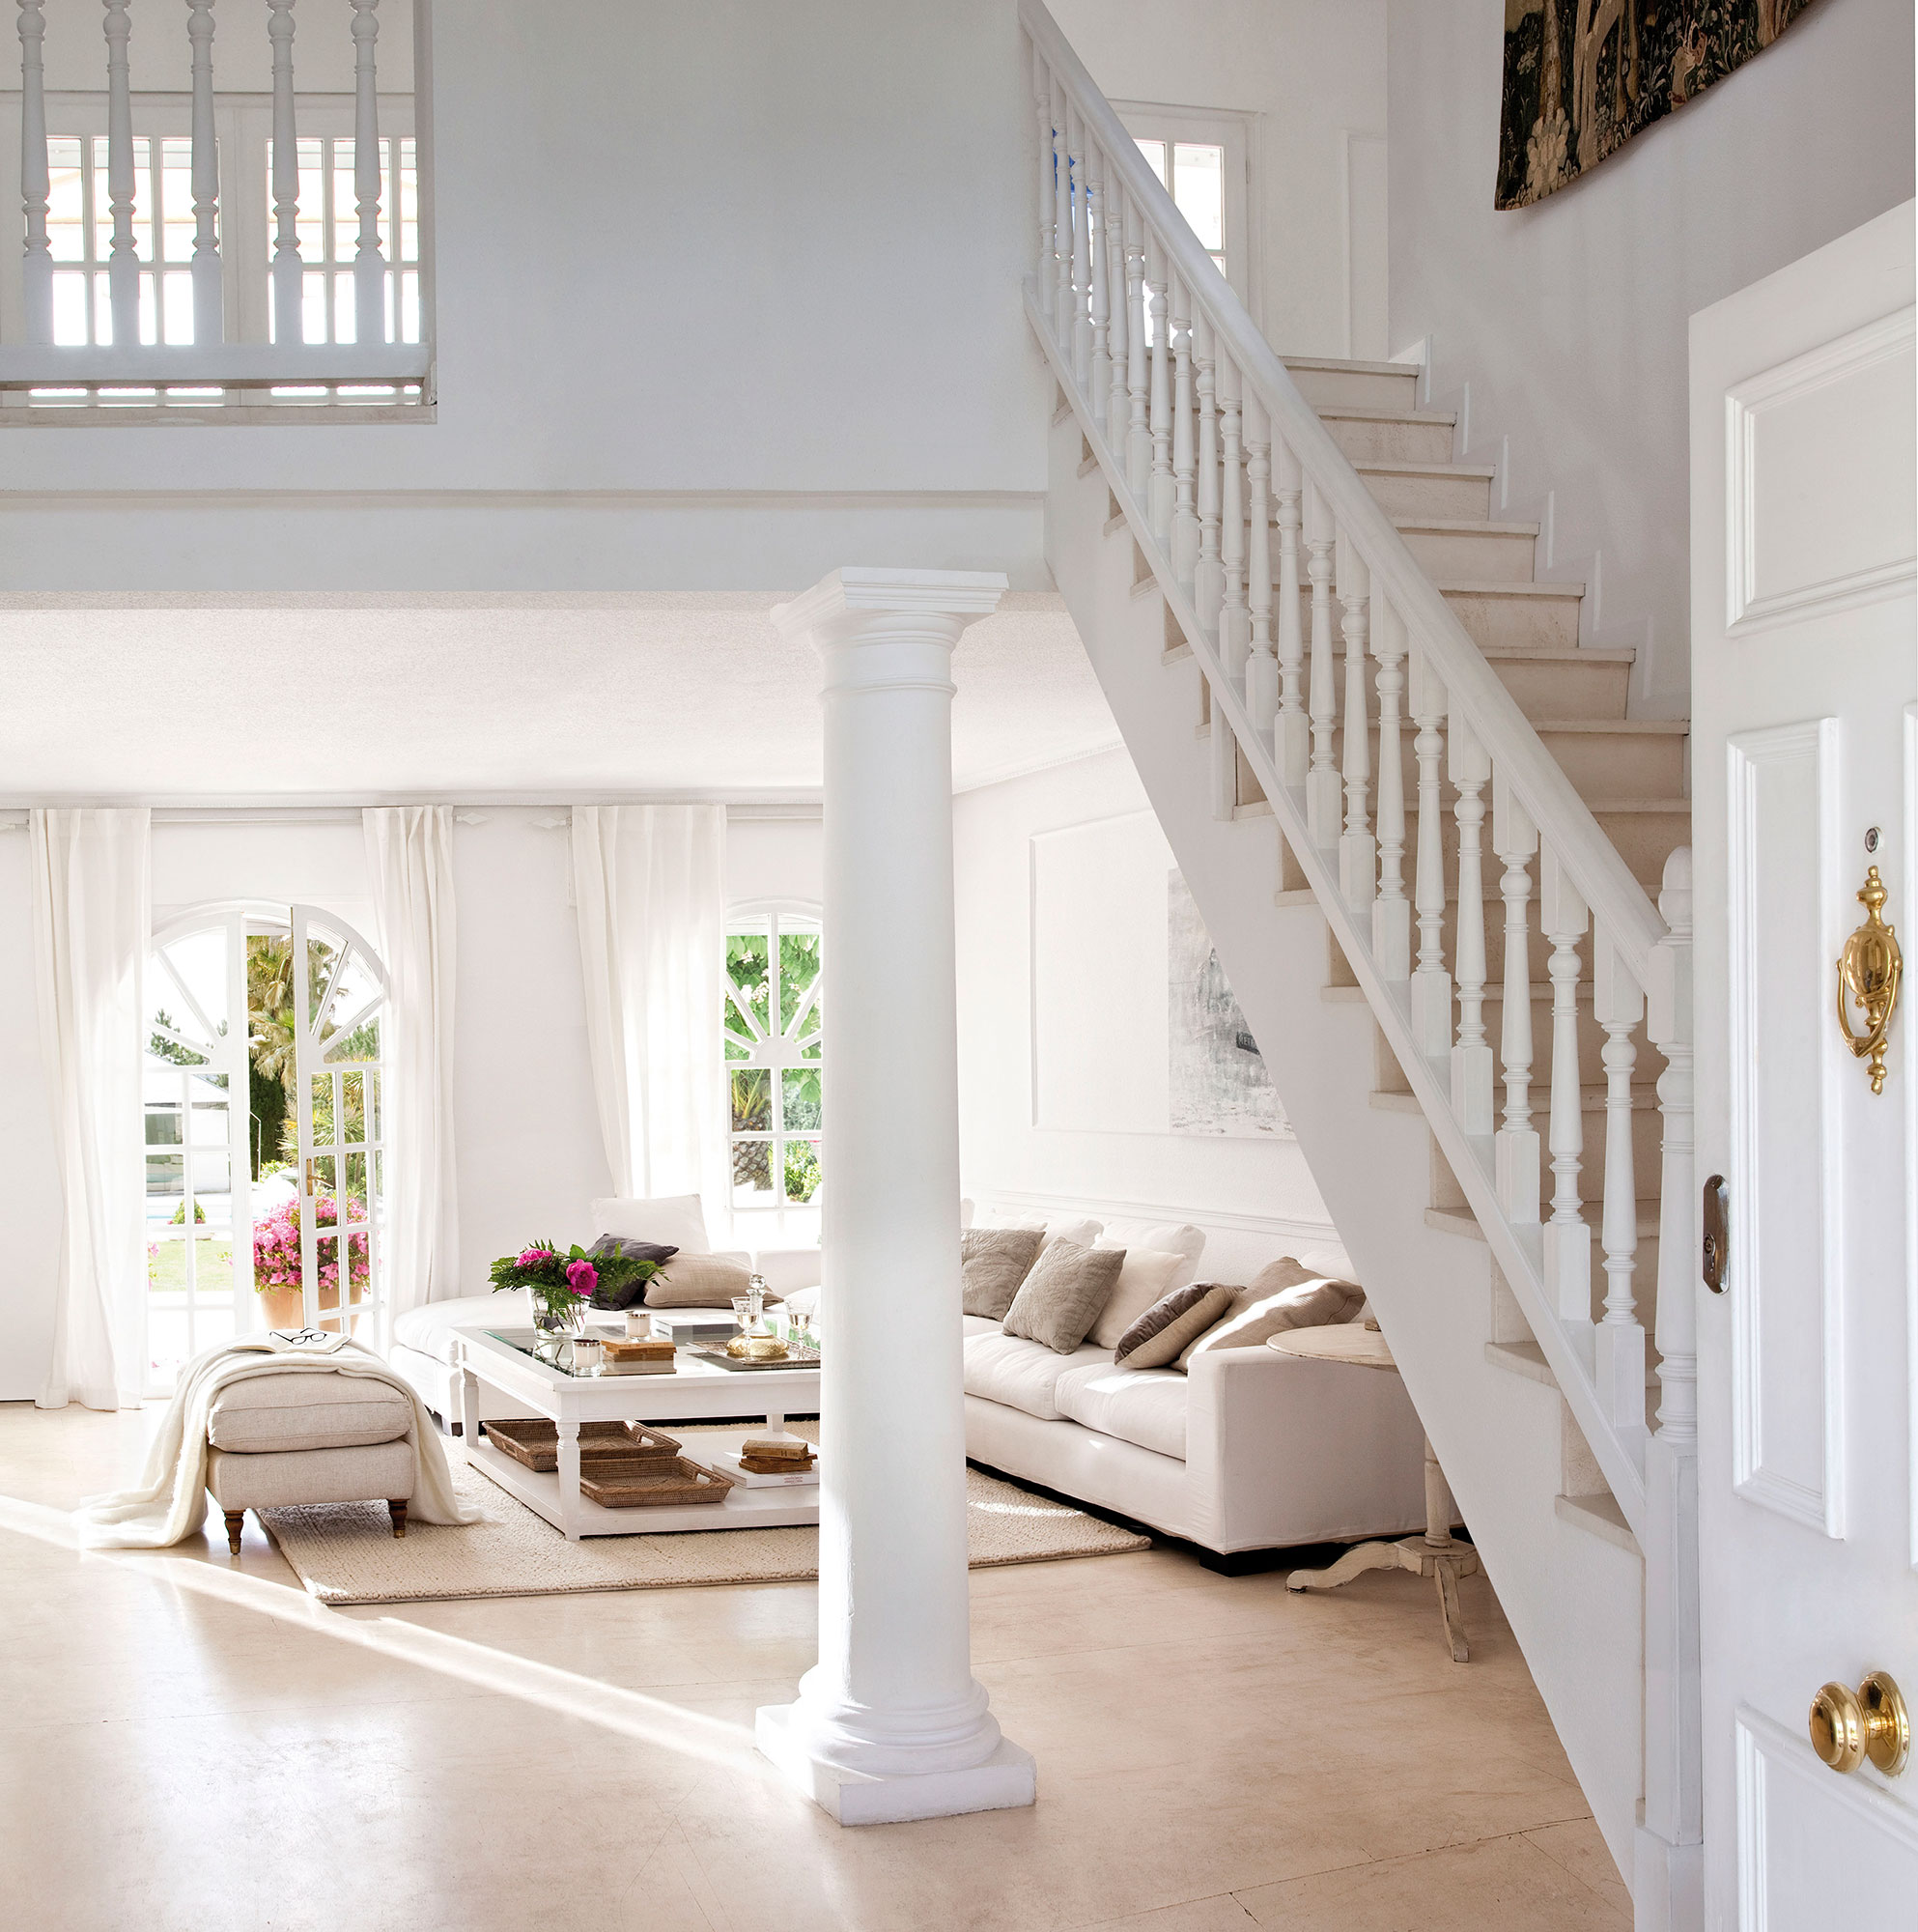 C mo elegir la cortina perfecta para cada ventana for Salones con escaleras interiores